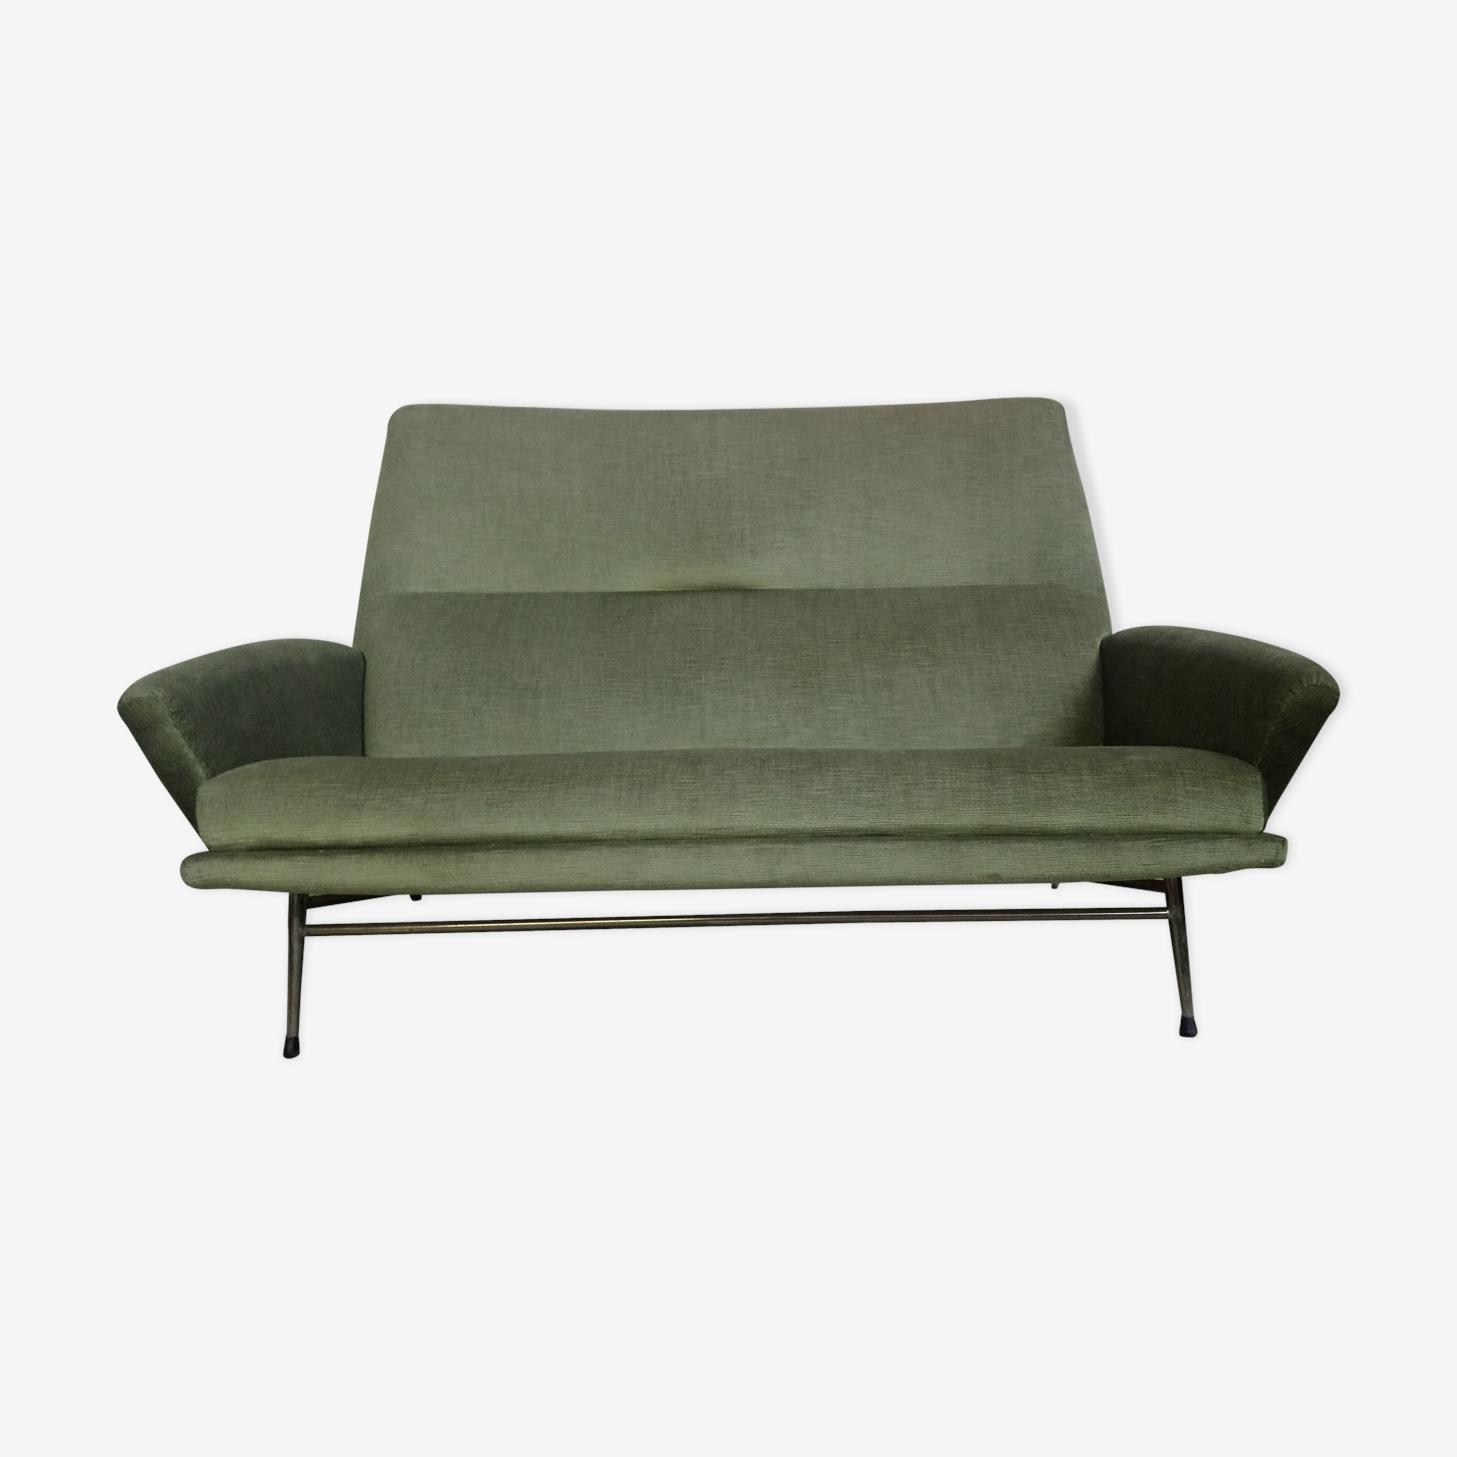 Sofa Guy Besnard